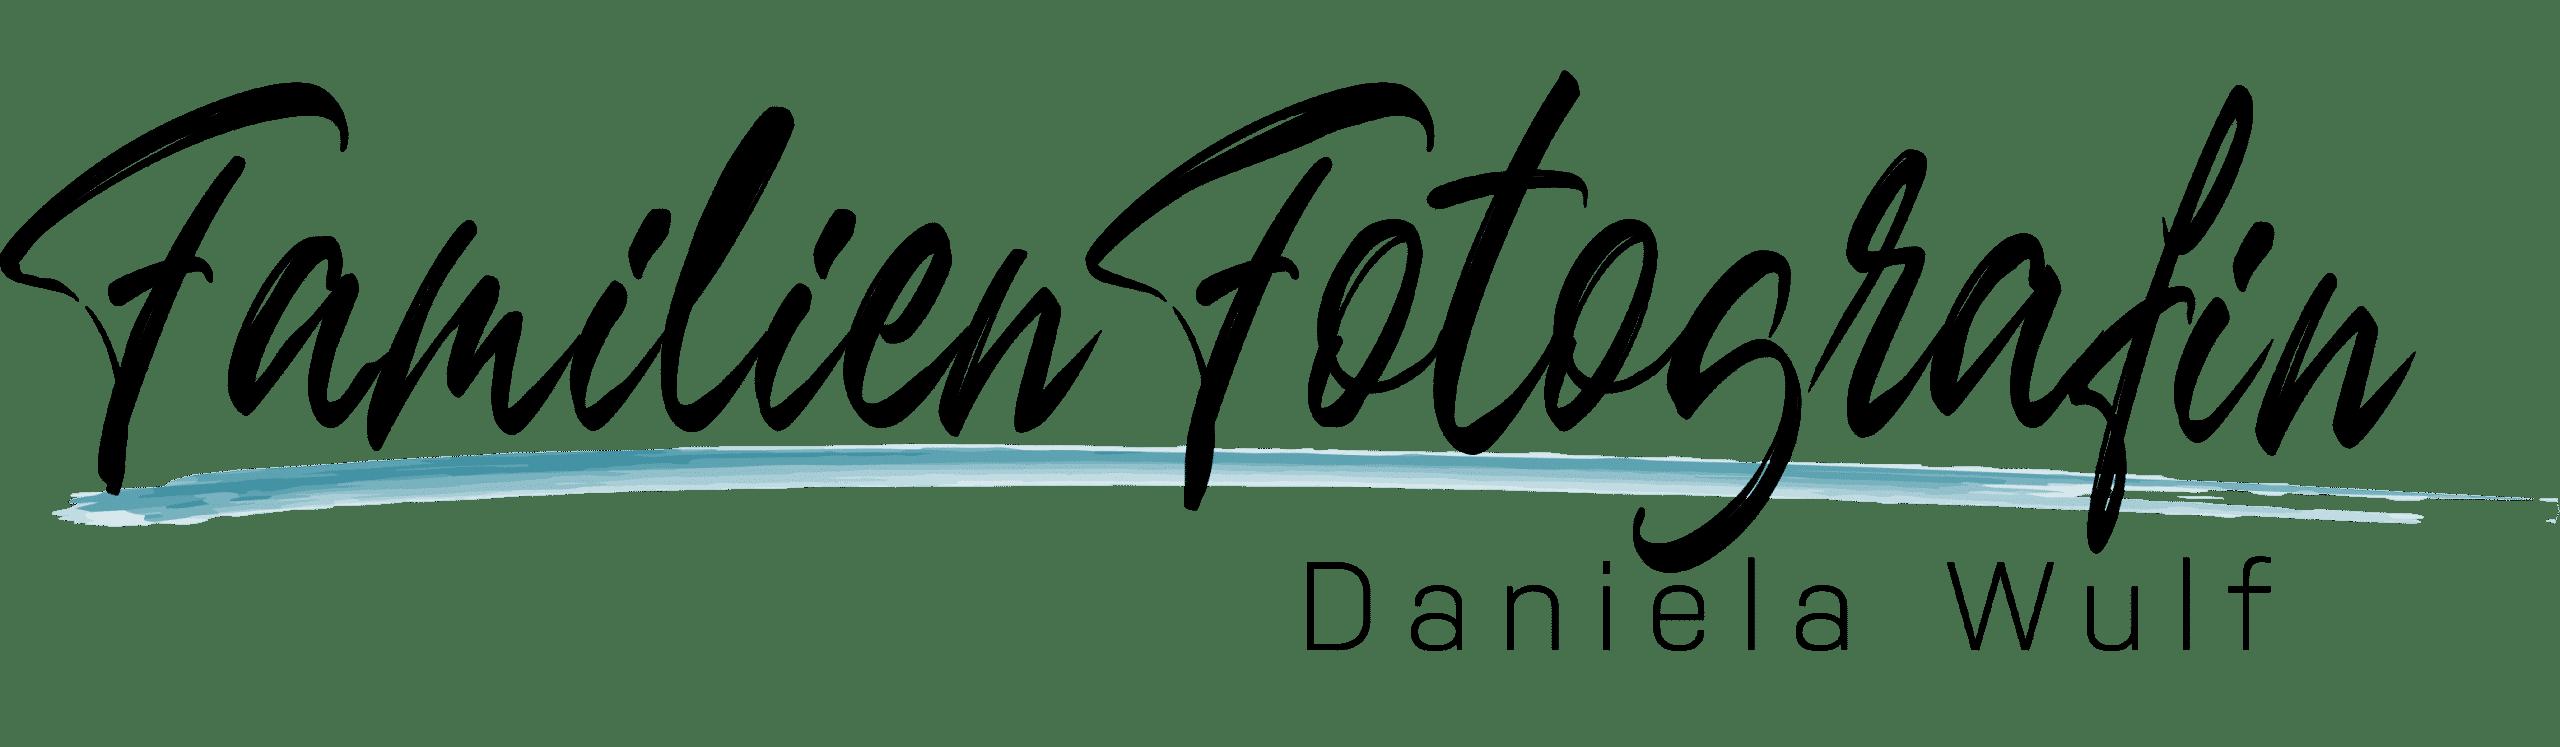 Familienfotografin – Daniela Wulf Logo